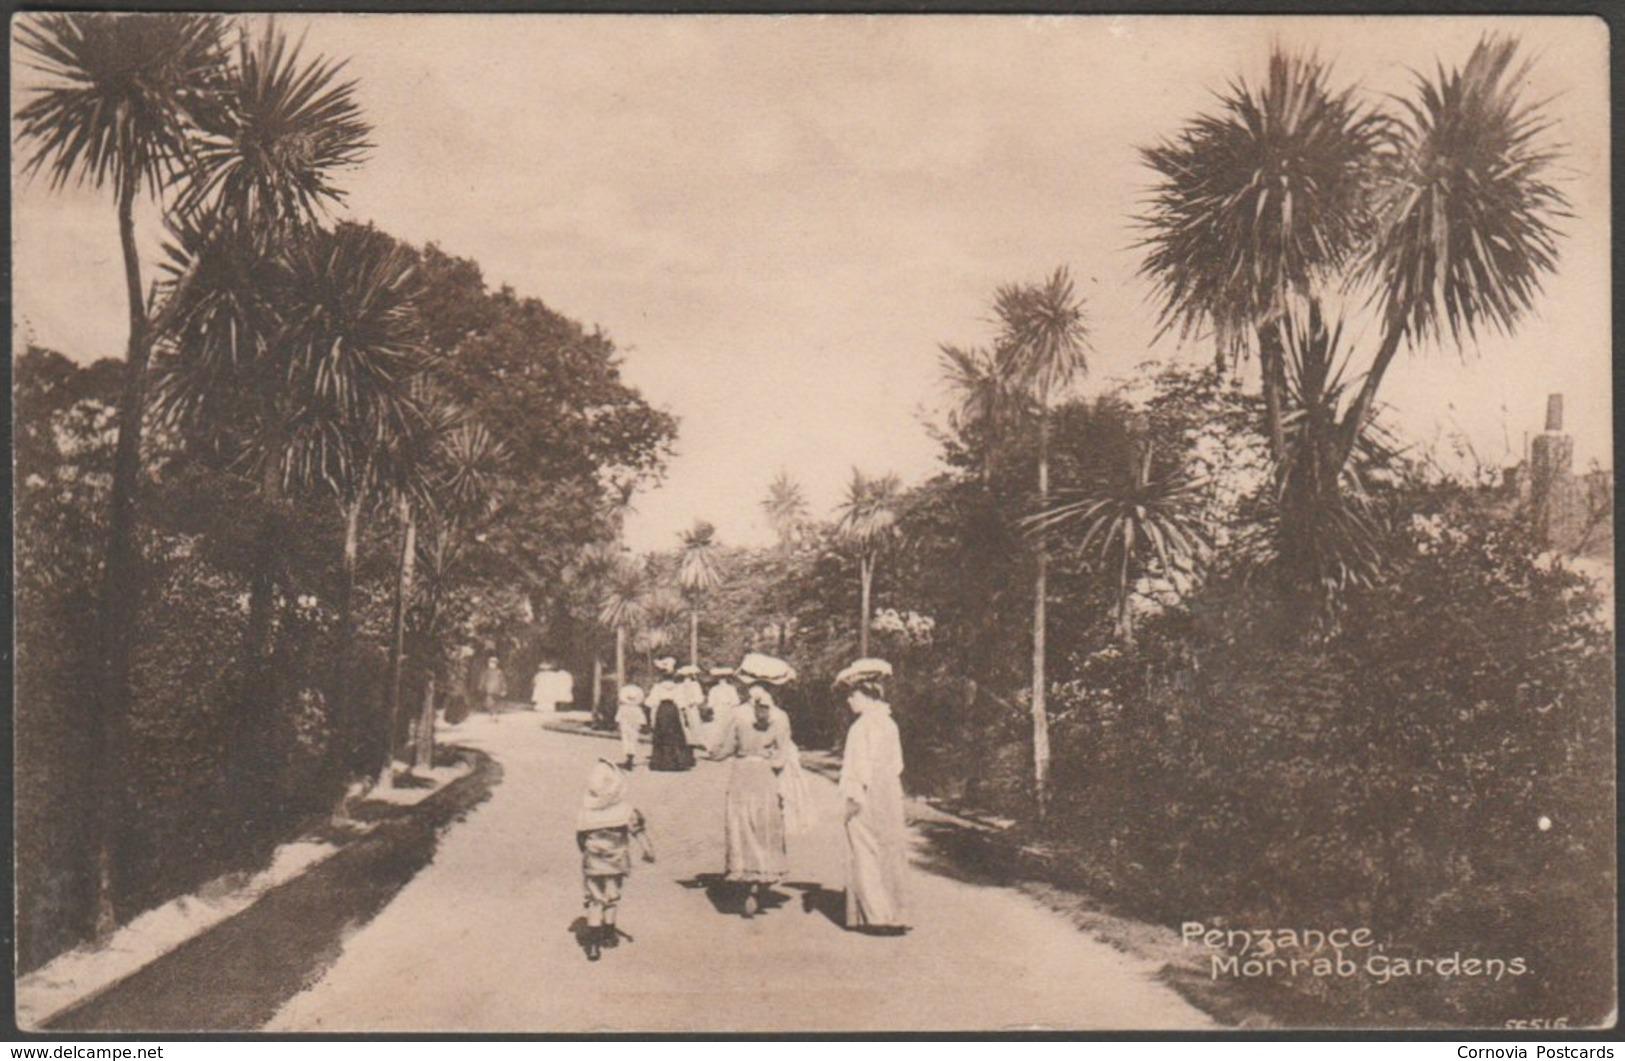 Morrab Gardens, Penzance, Cornwall, 1913 - Frith's Postcard - England